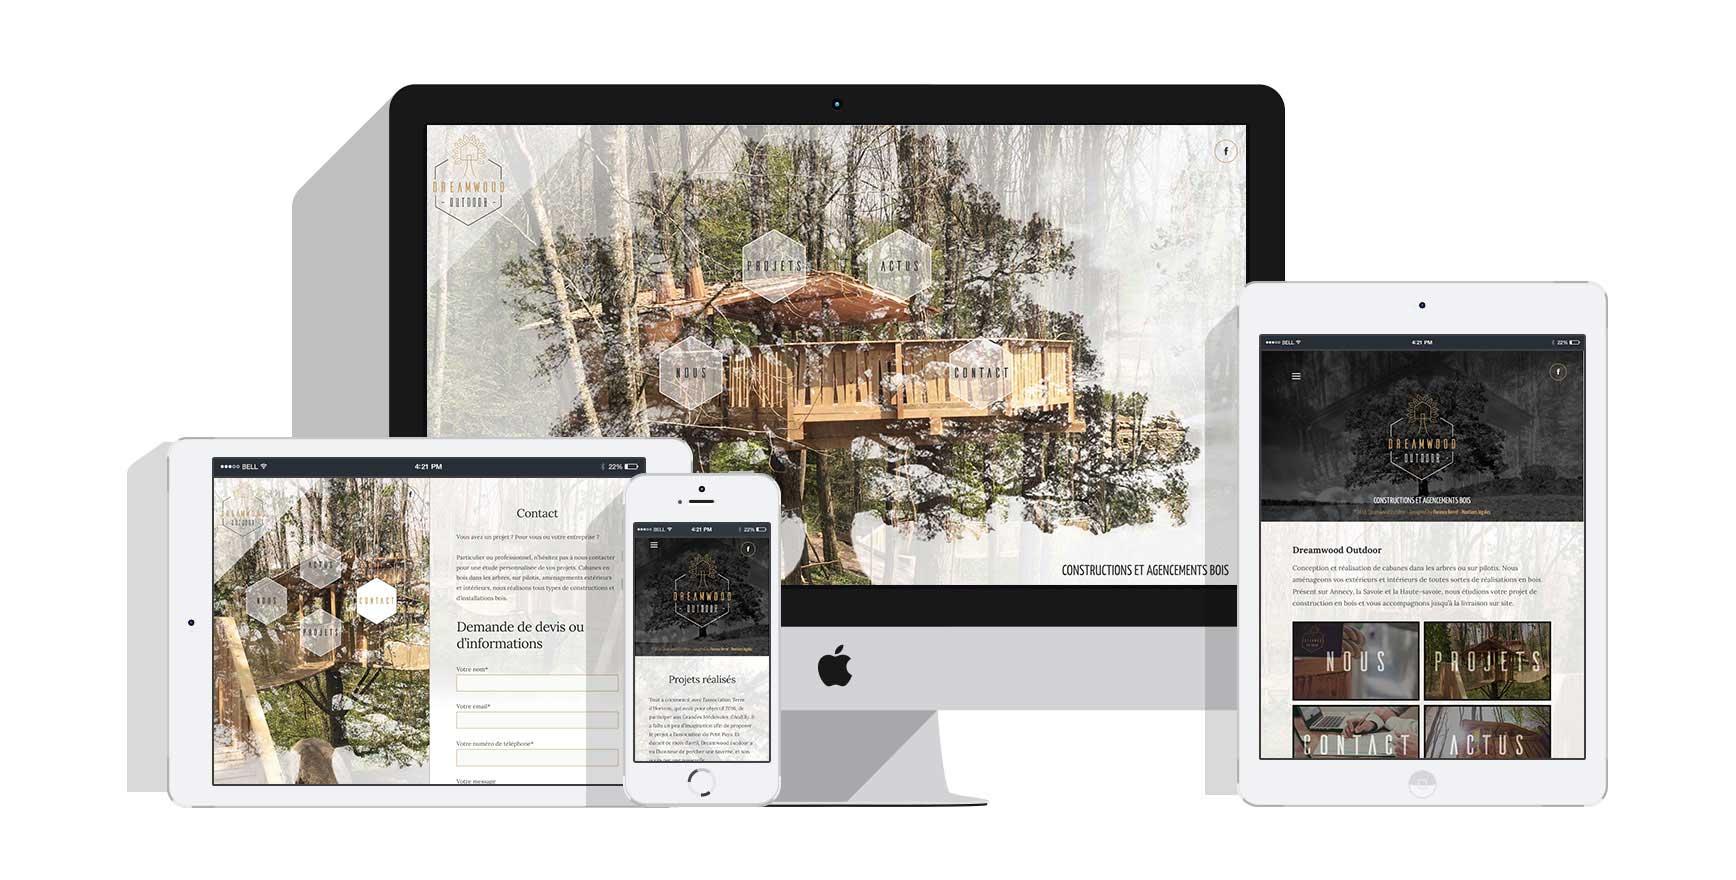 portfolio-dreamwood-florence-borrel-flobo-design-graphique-infographie-webdesign-savoie-tarentaise-meribel-menuires-courchevel